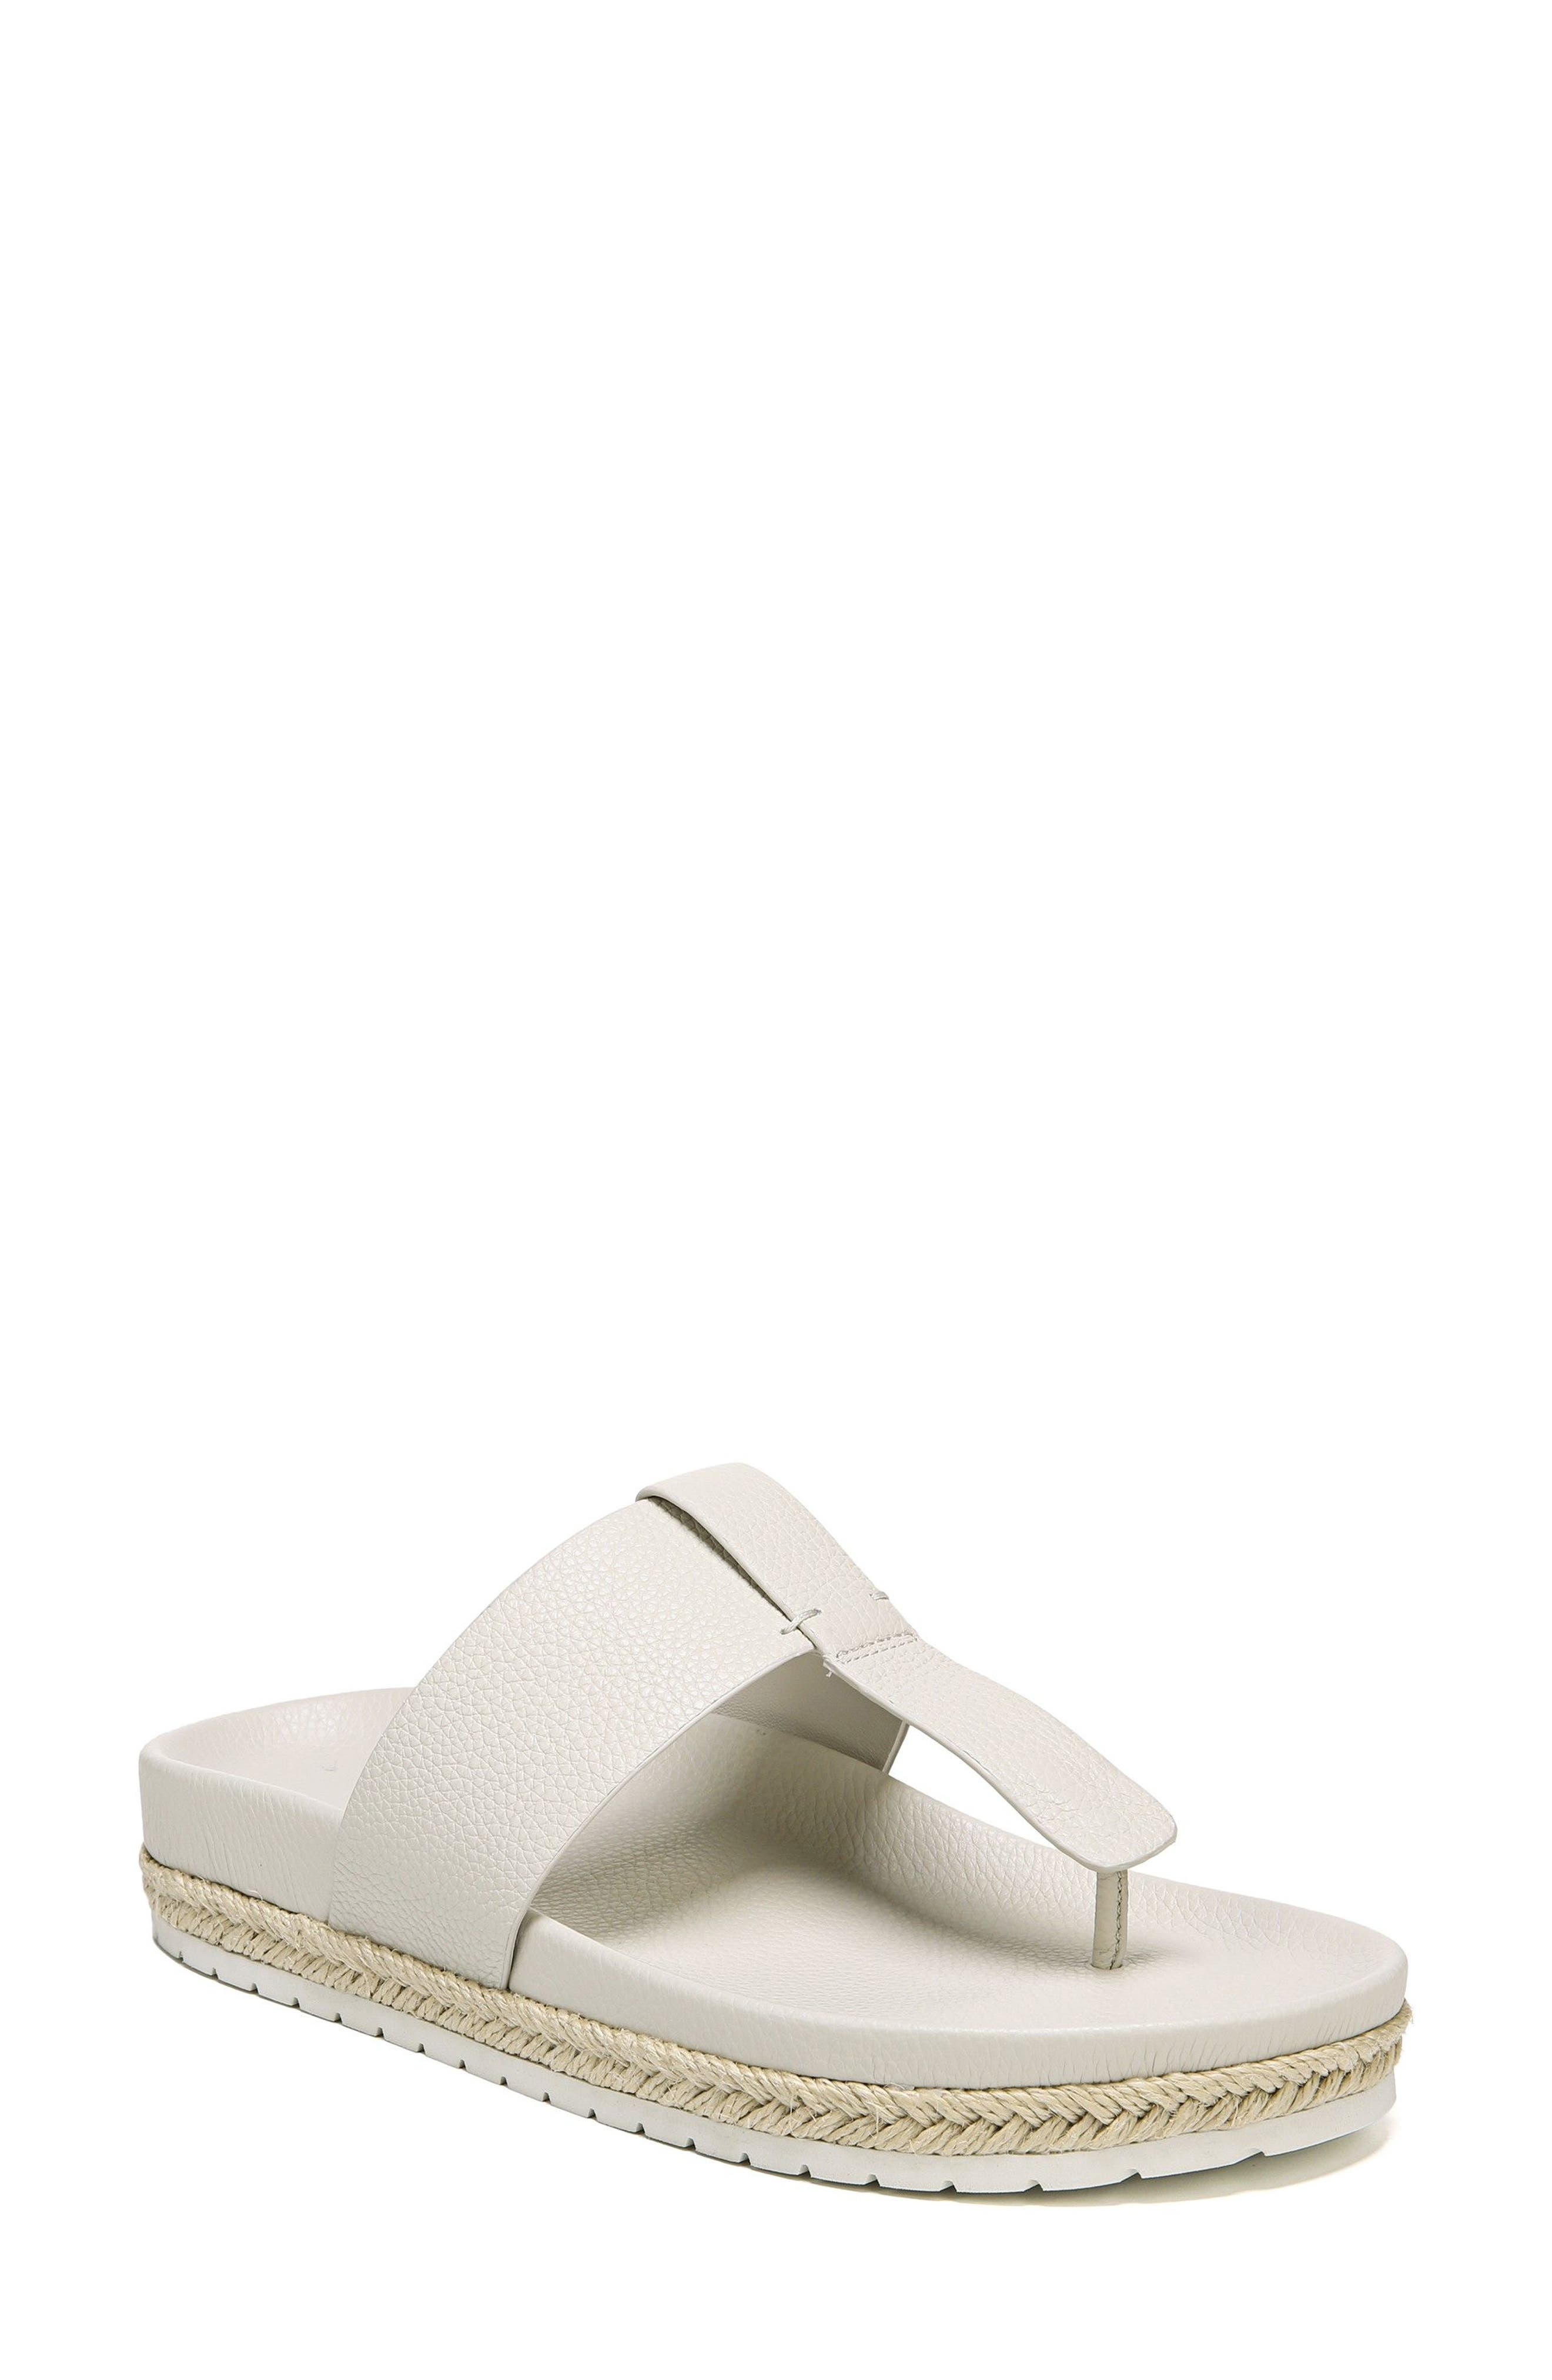 Avani T-Strap Flat Sandal,                         Main,                         color, Oyster